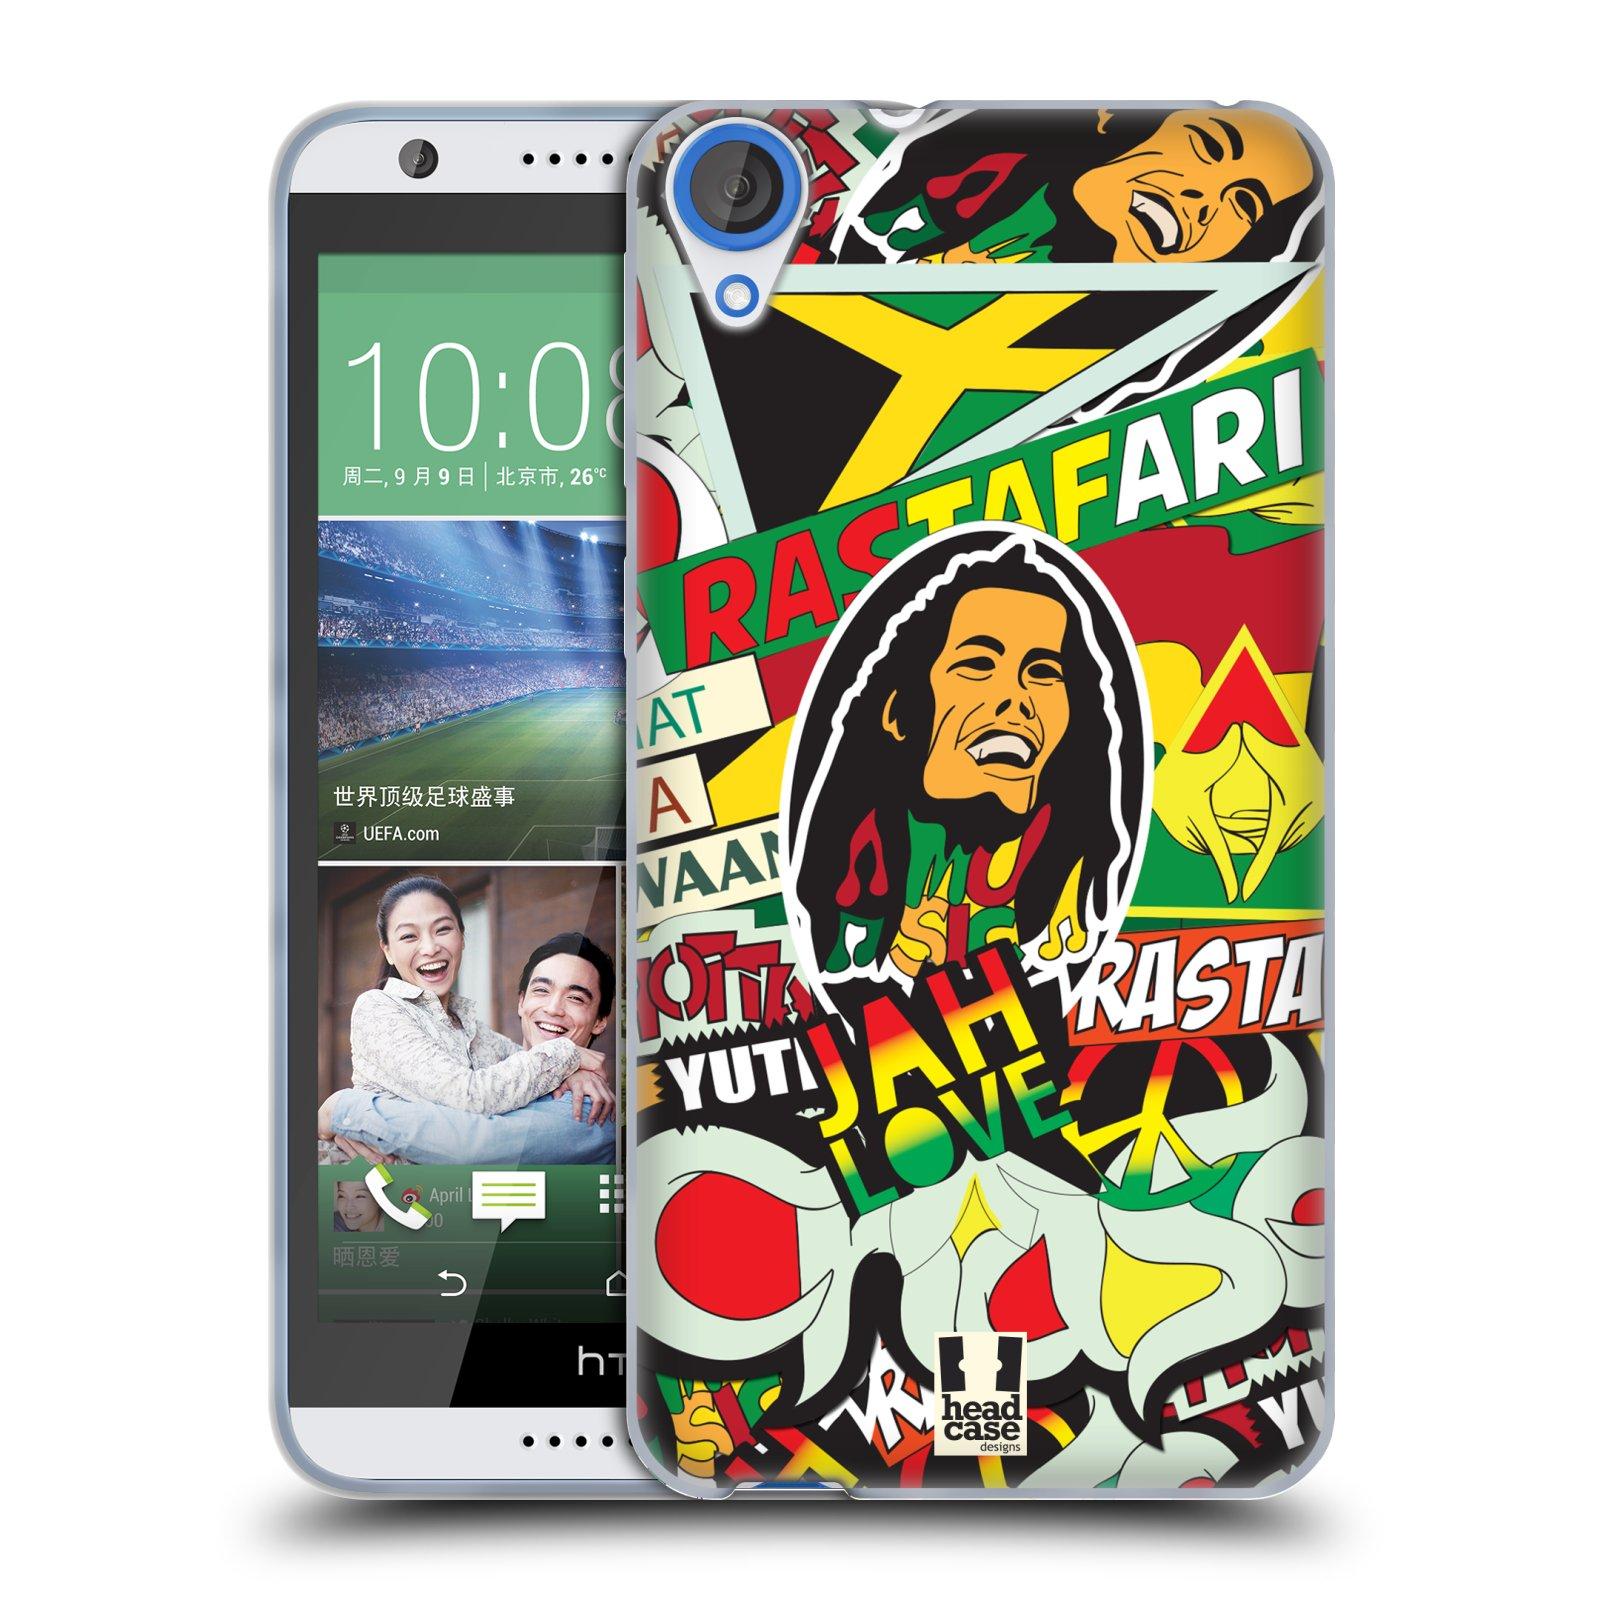 Silikonové pouzdro na mobil HTC Desire 820 HEAD CASE RASTA (Silikonový kryt či obal na mobilní telefon HTC Desire 820)